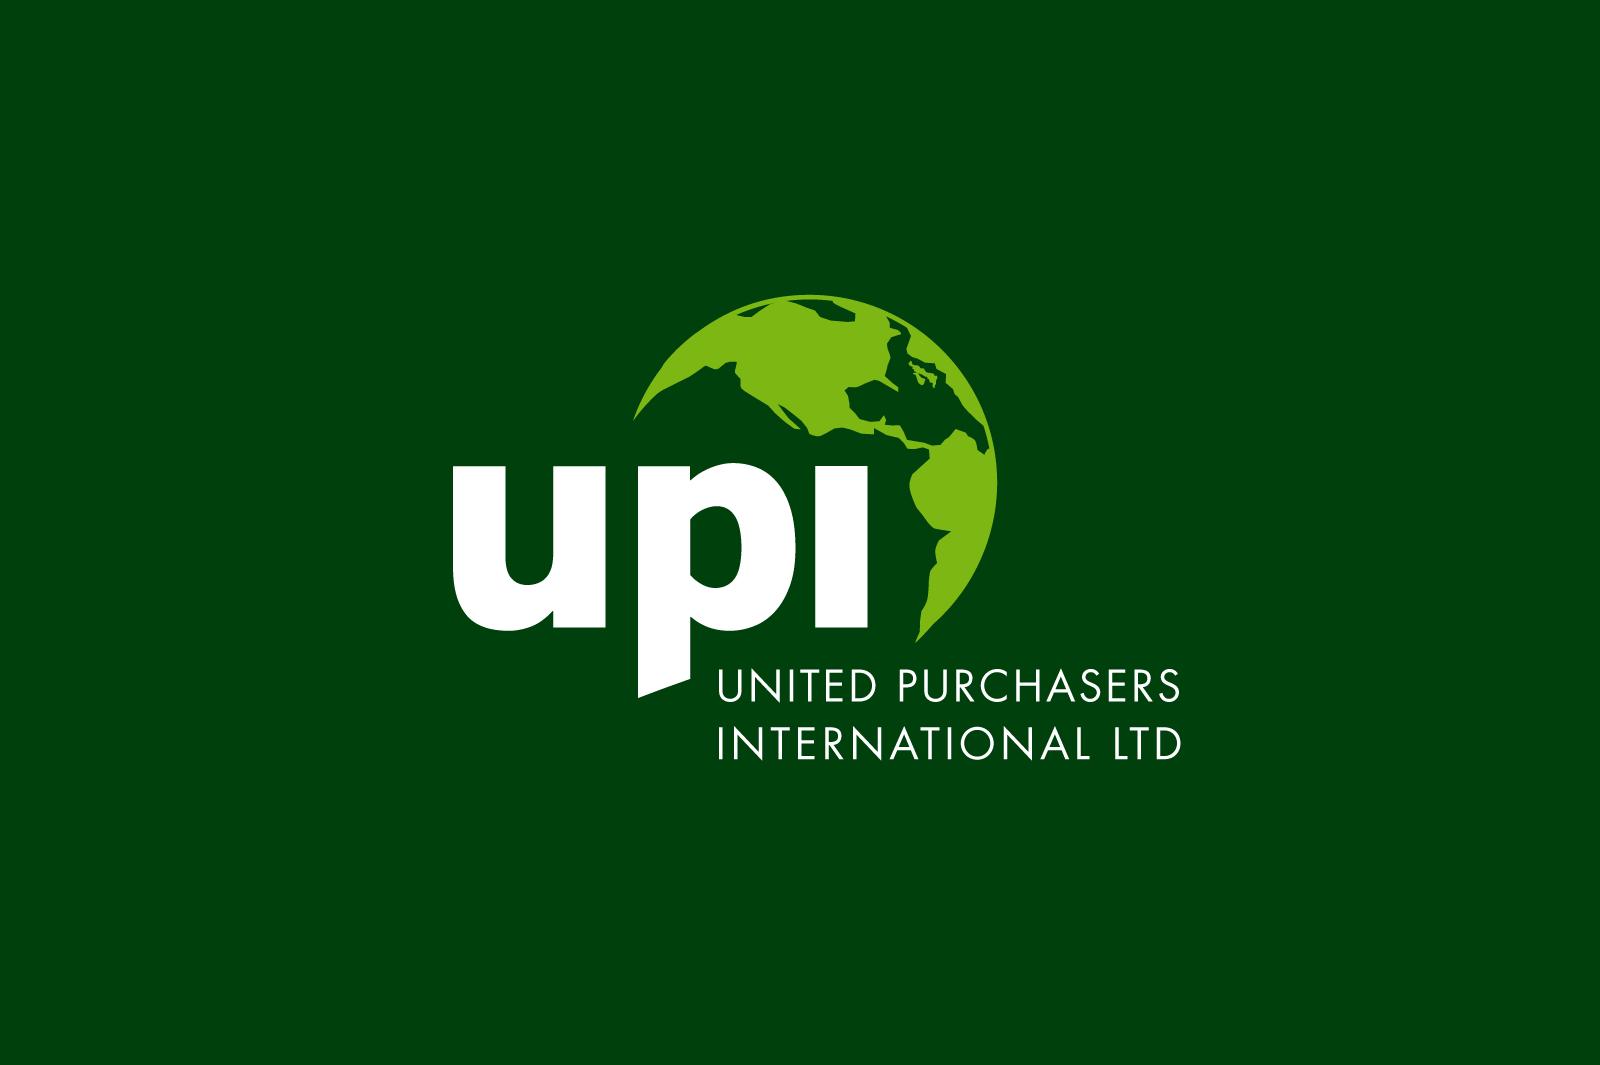 UPI / LOGO | monografik creative studio: http://monografik.com.cy/work/upi-logo/